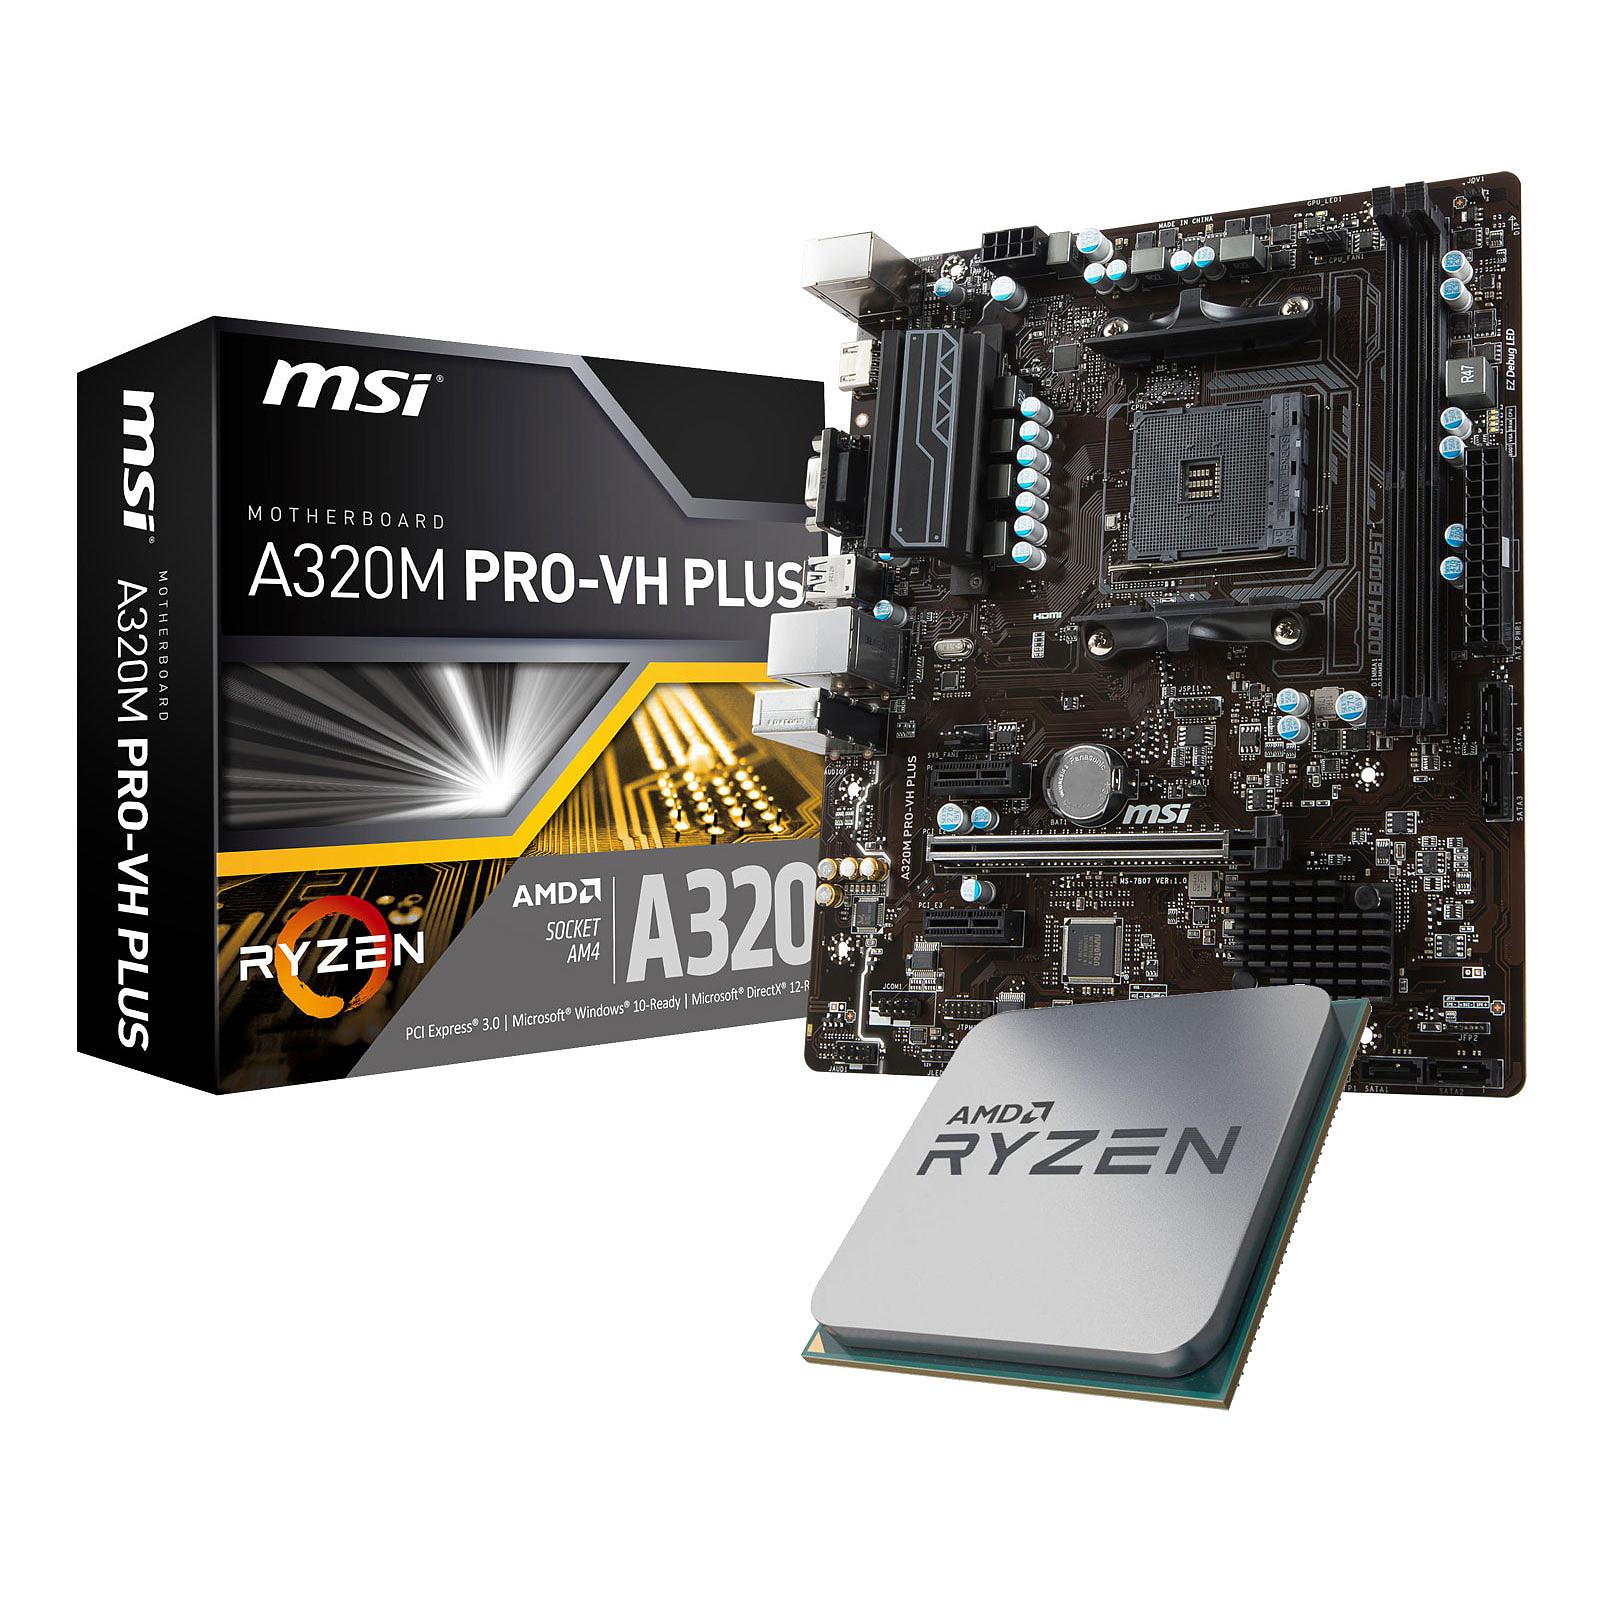 Kit Upgrade PC AMD Ryzen 5 2400G MSI A320M PRO-VH PLUS